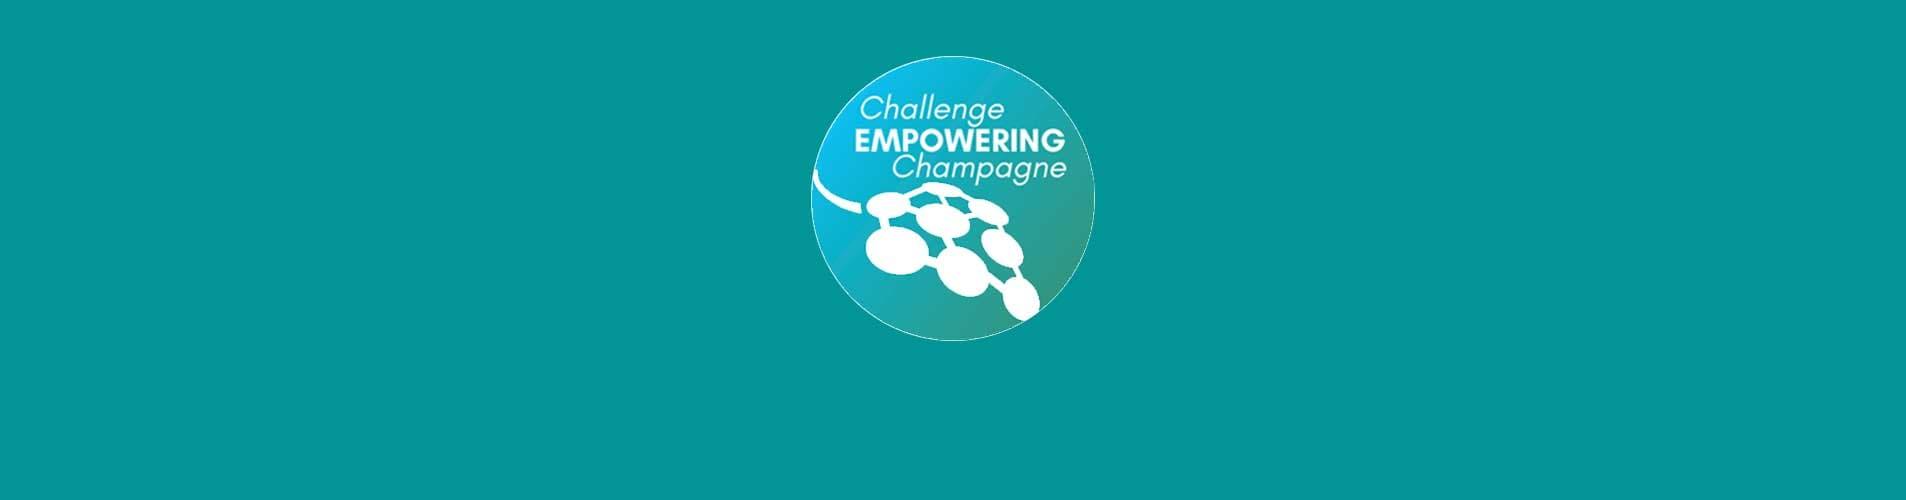 challenge empowering champagne